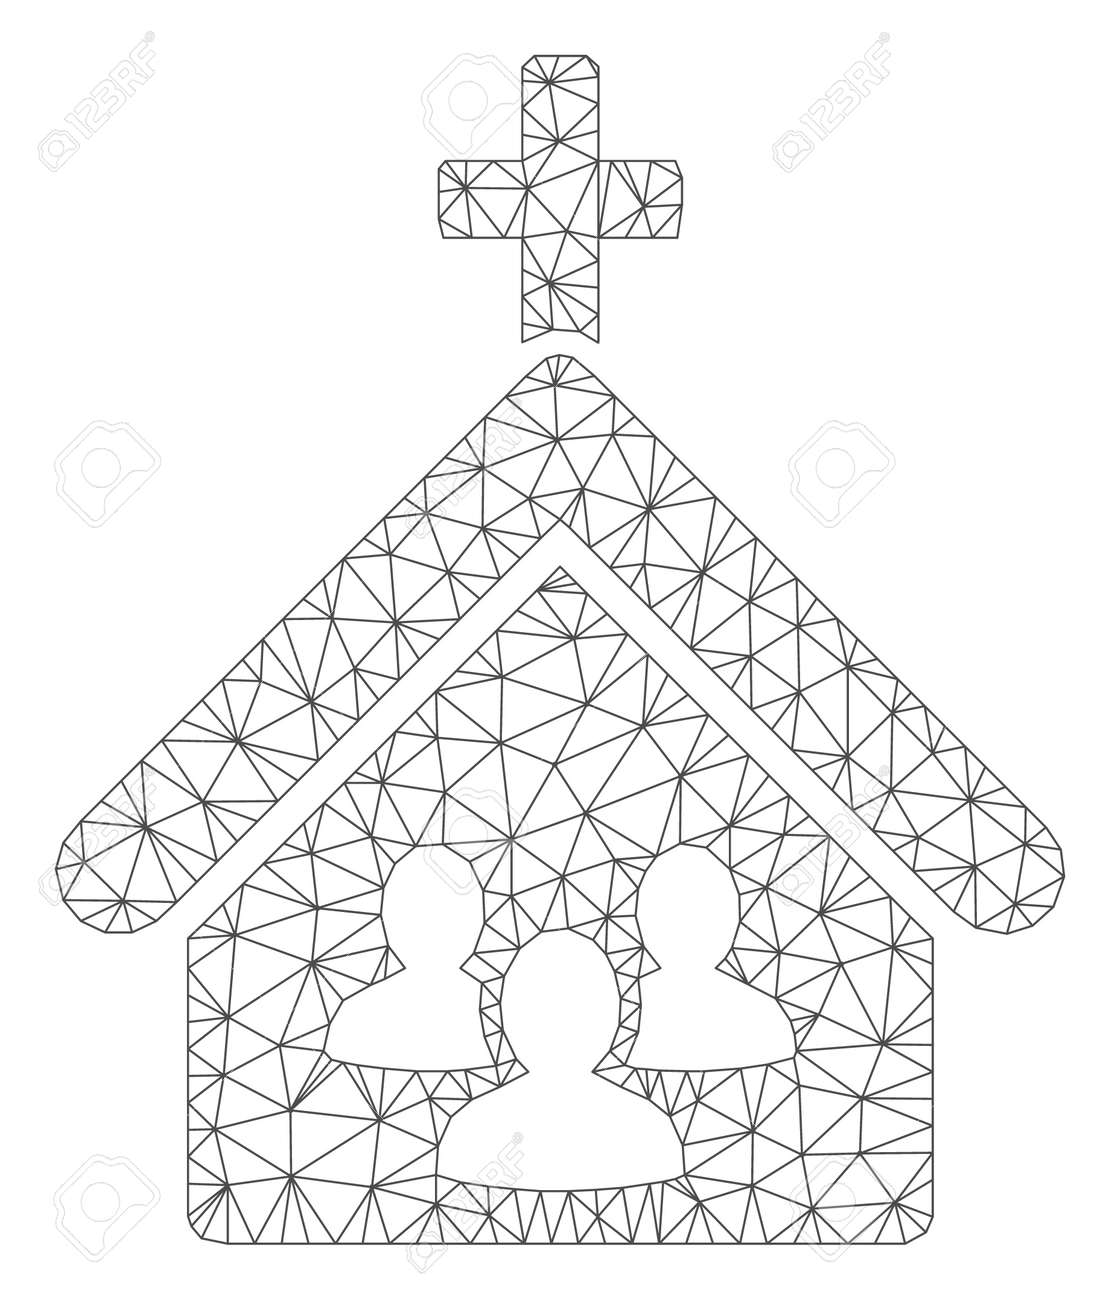 Children clipart church, Children church Transparent FREE for download on  WebStockReview 2020